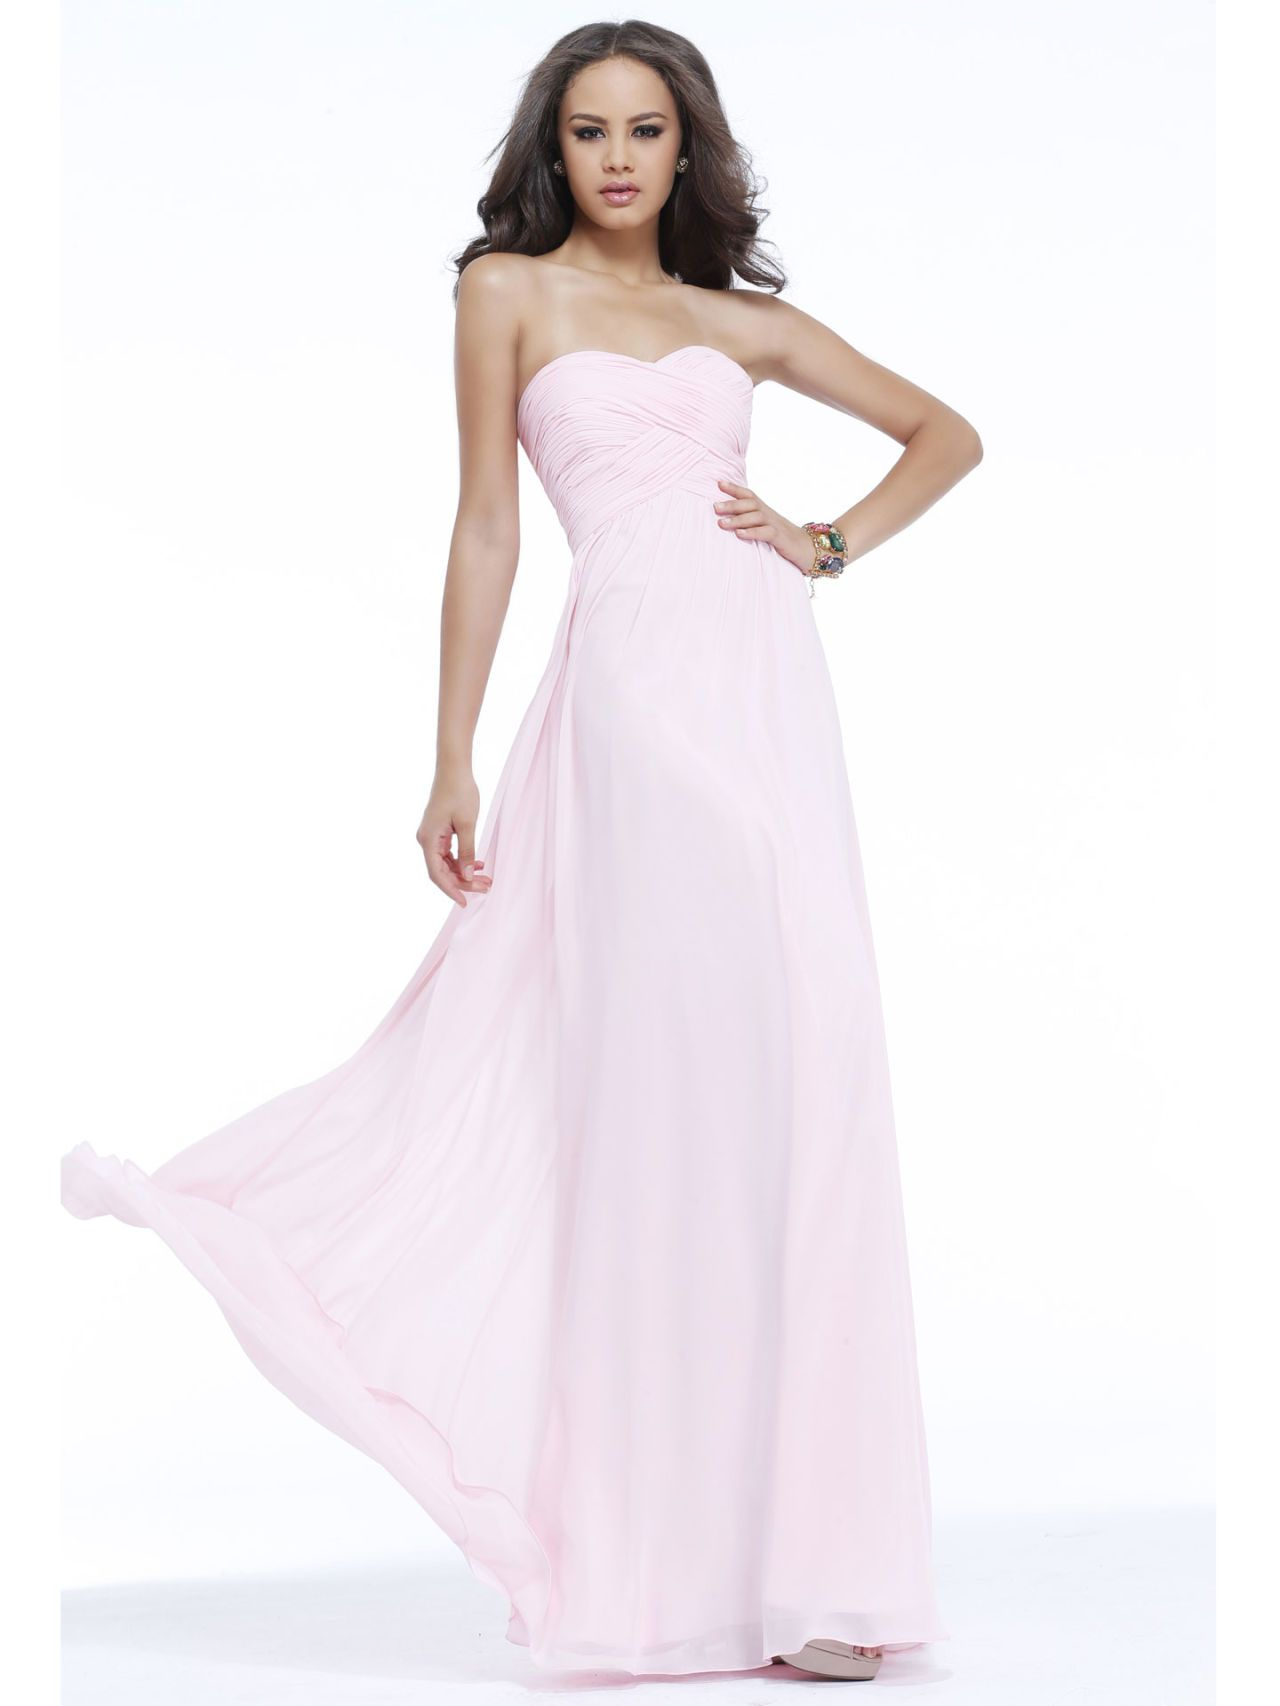 Prom Dresses in 2014